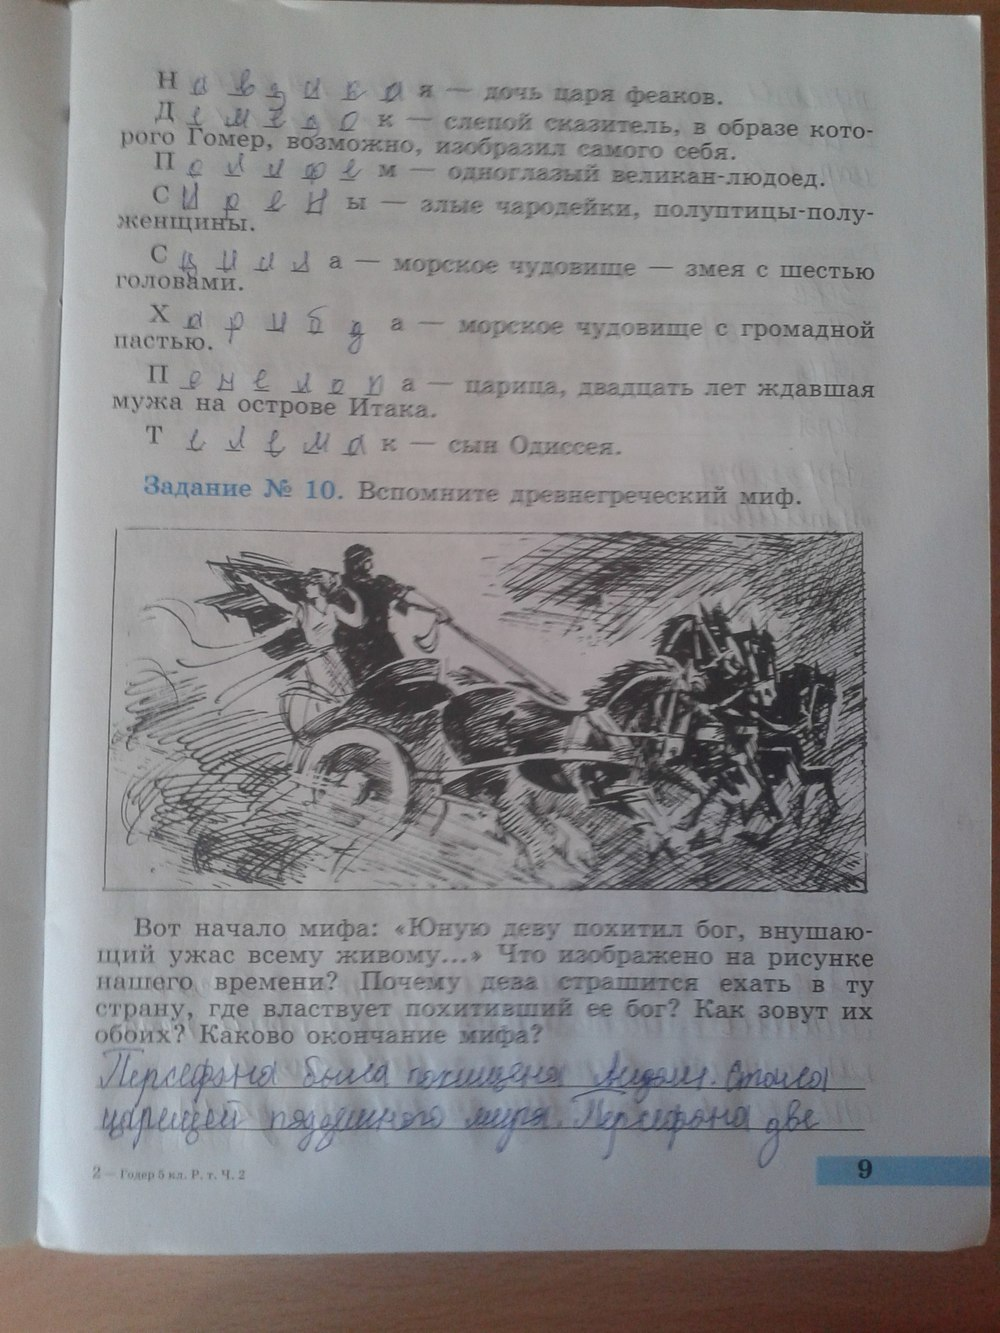 Гдз по рабочей тетради по истории 5 класс годер от путина